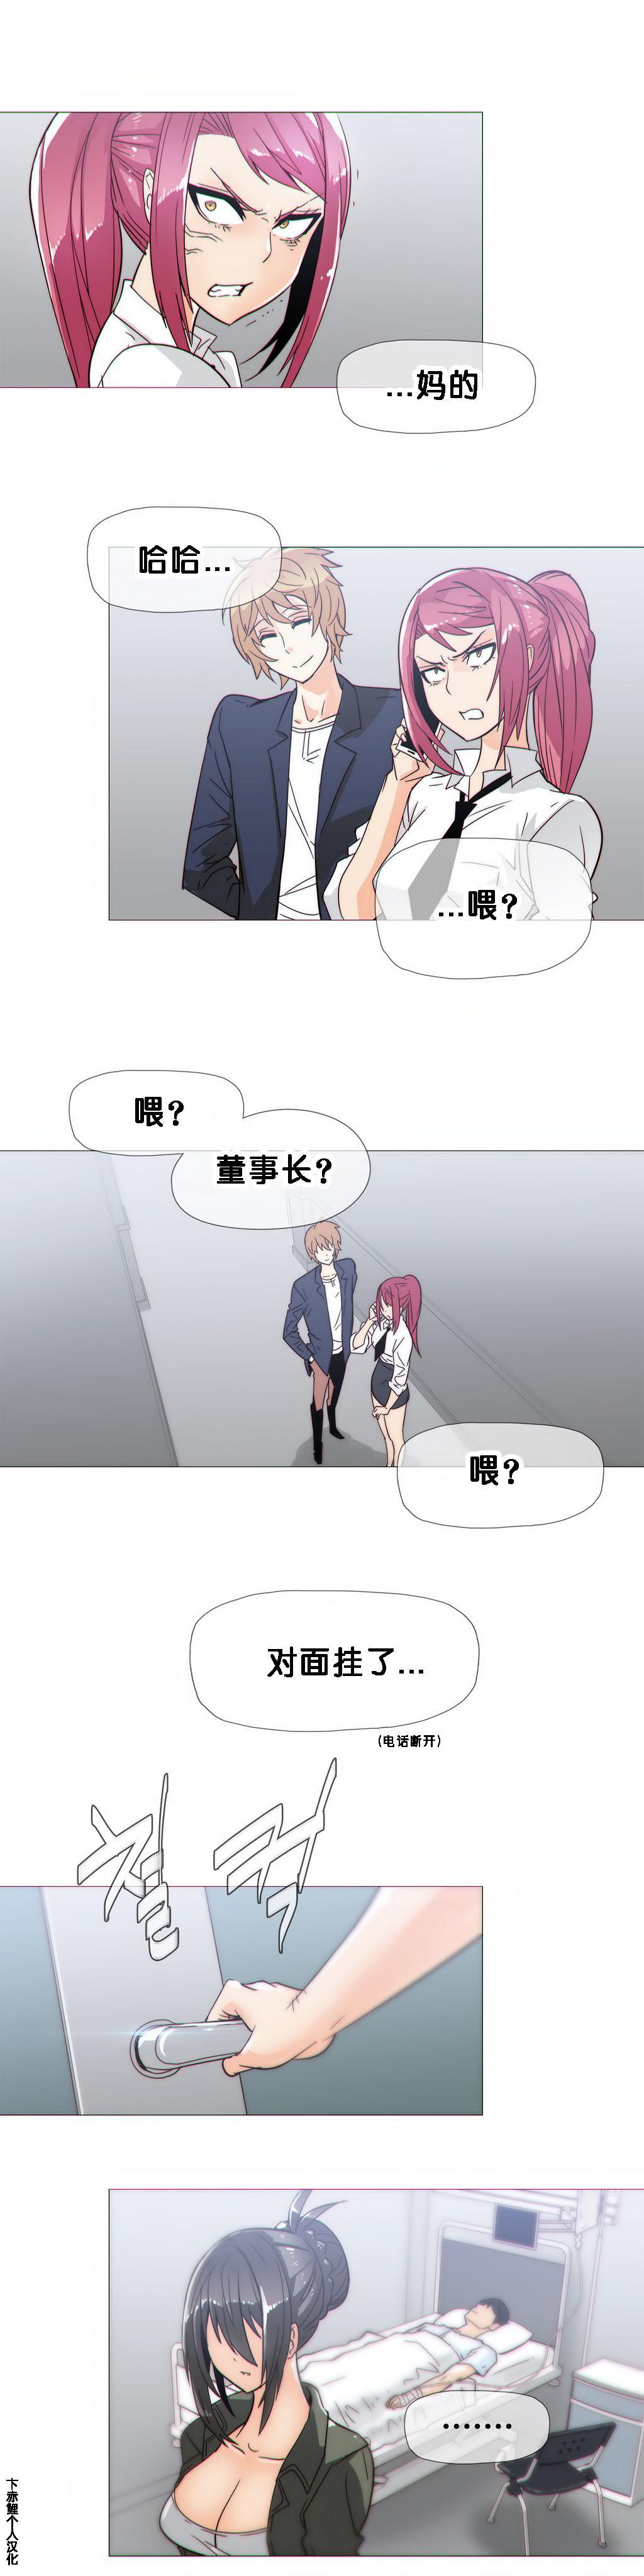 HouseHold Affairs 【卞赤鲤个人汉化】1~21话(持续更新中) 460